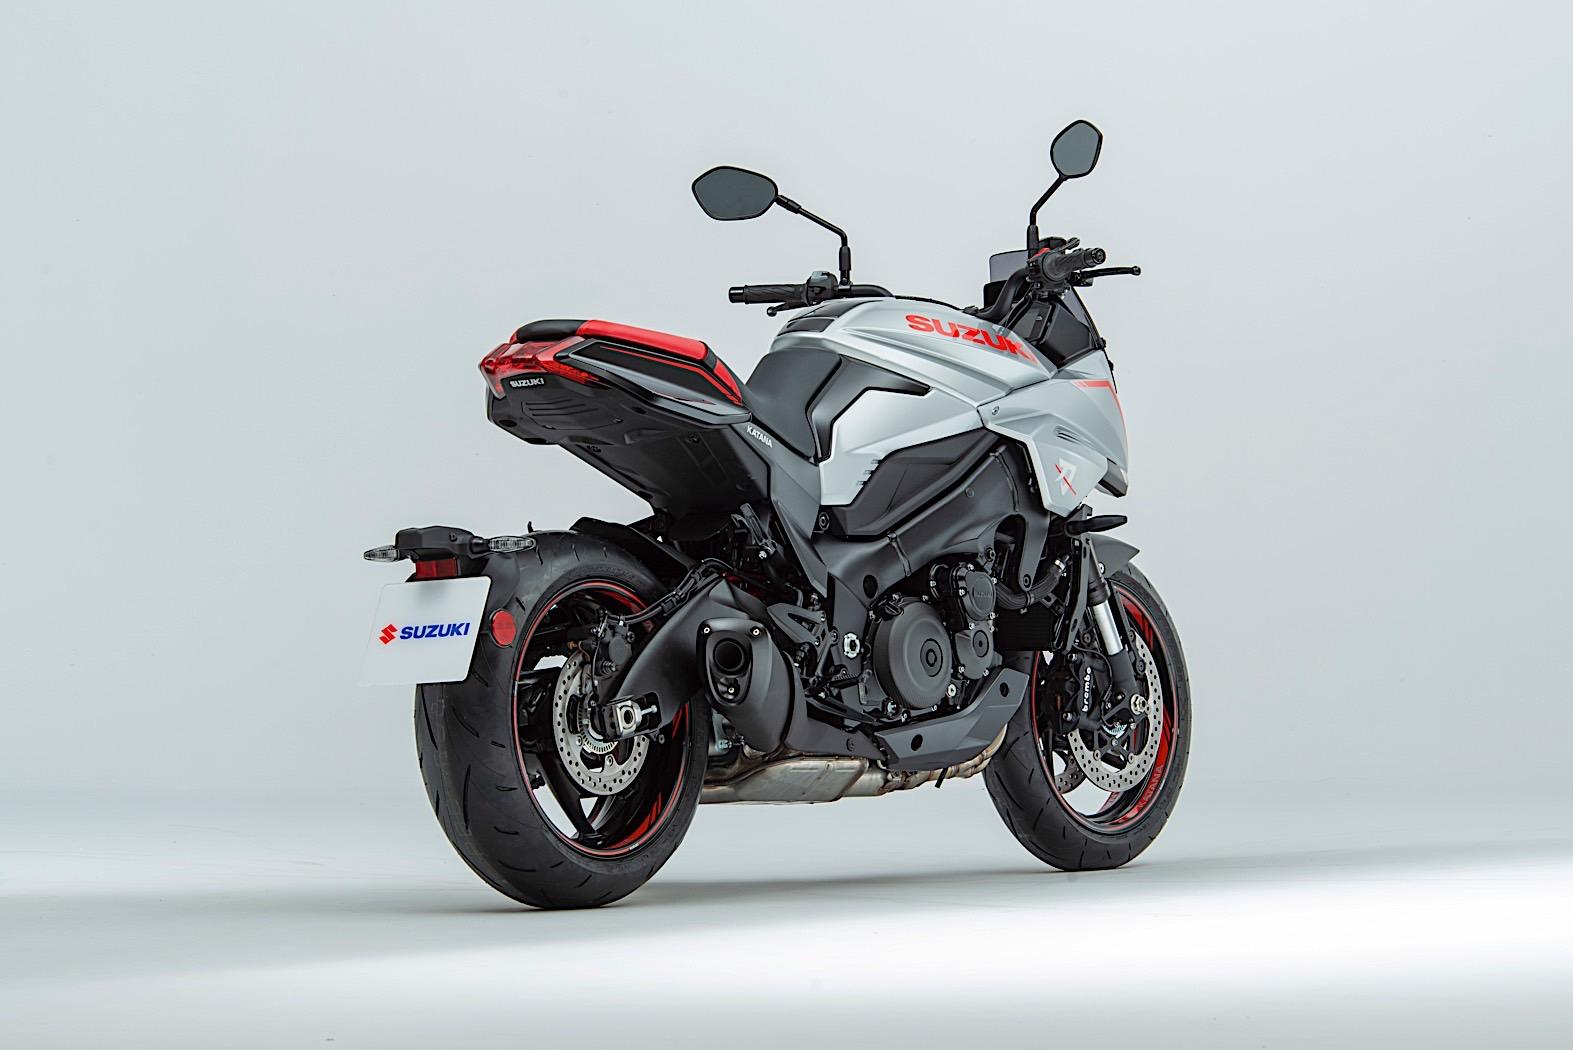 2020 Suzuki Katana Available with Samurai Pack in the UK, Priced